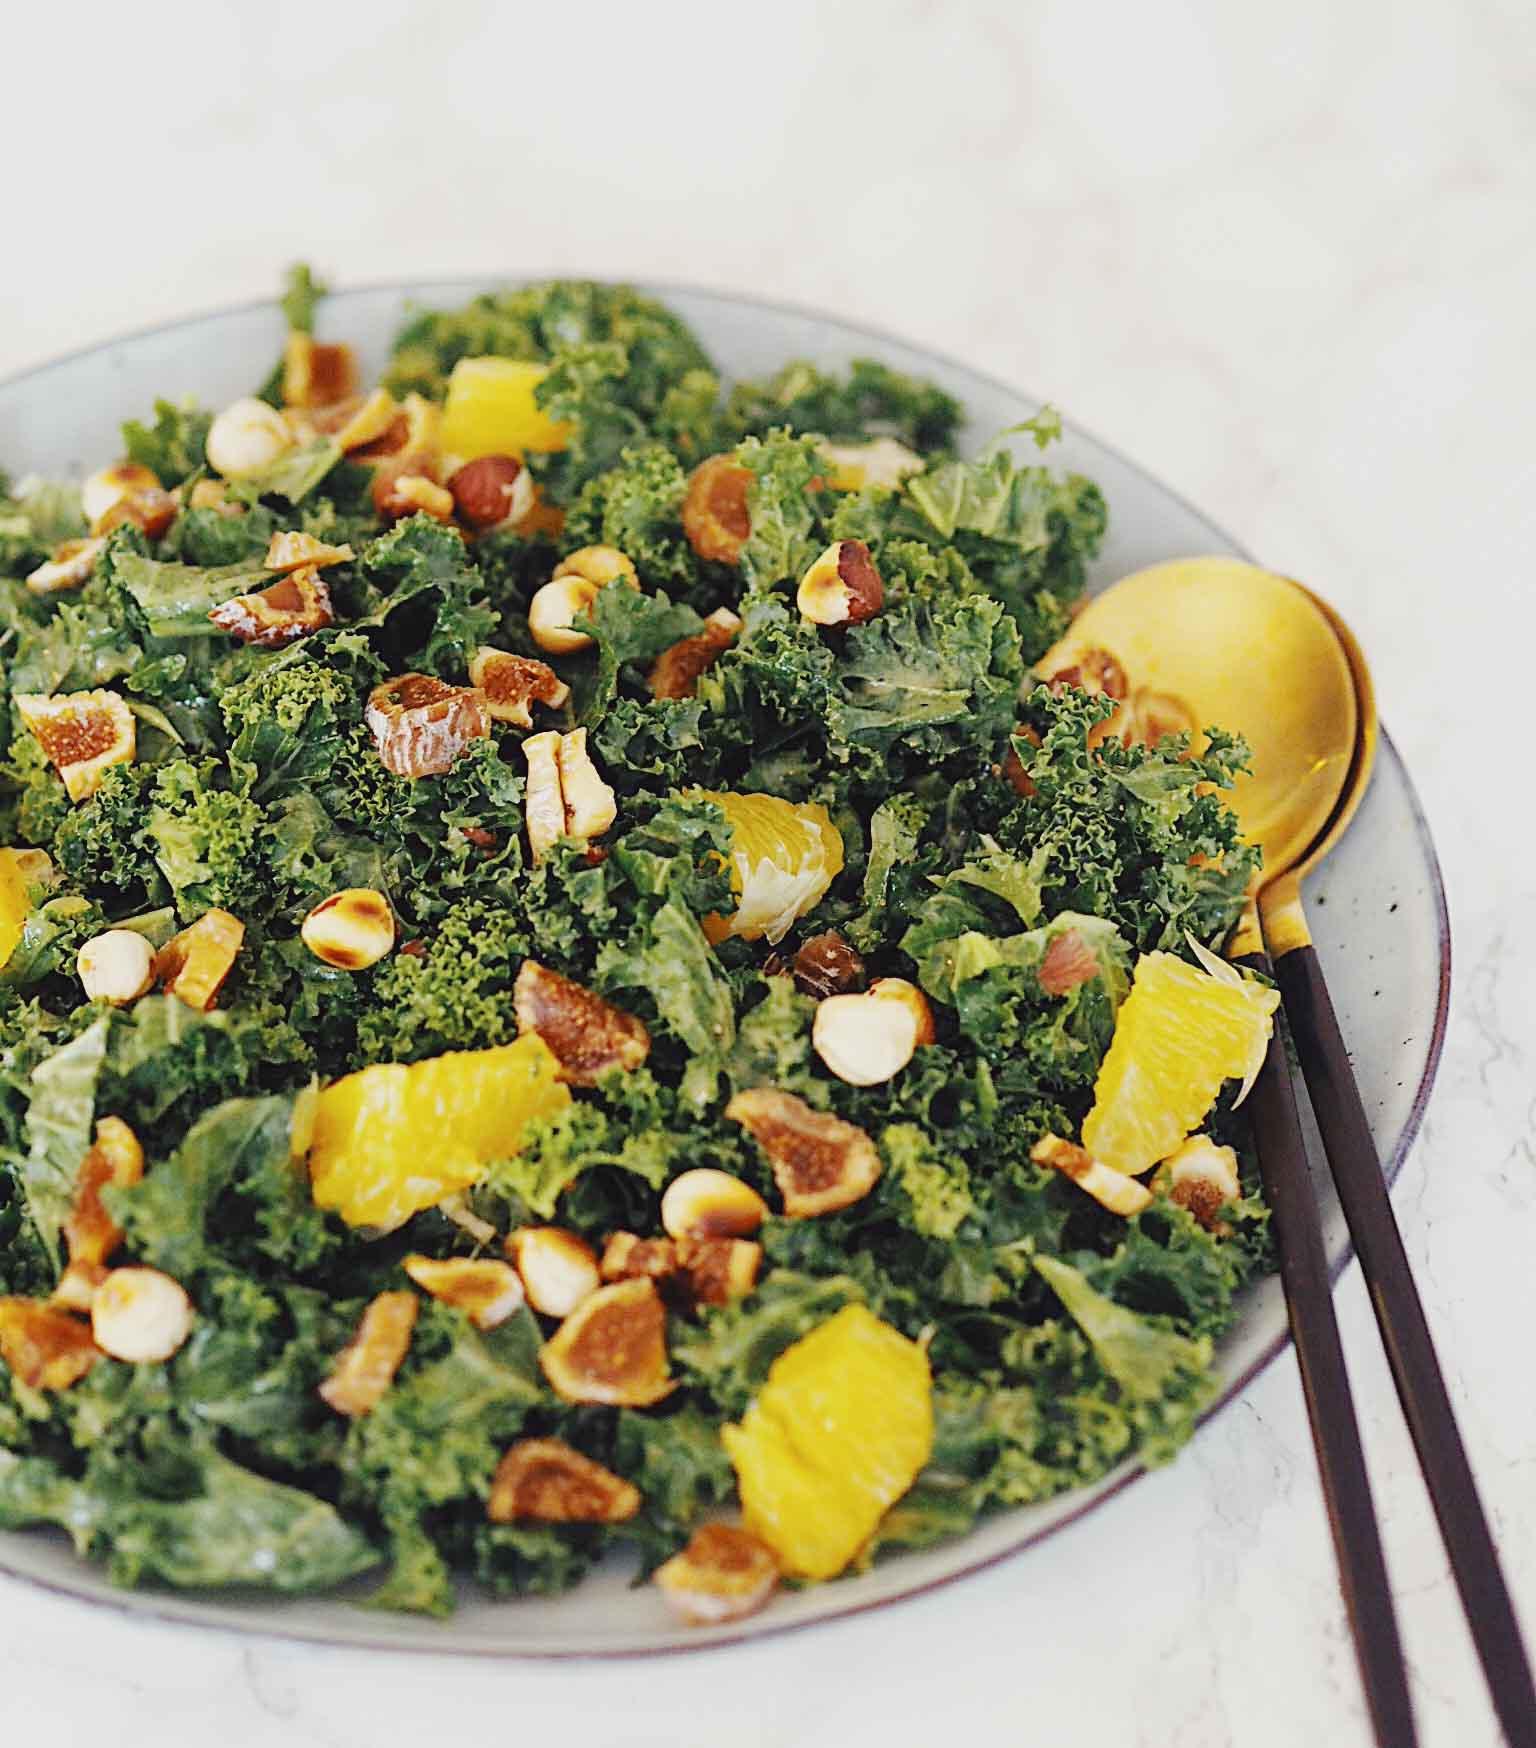 Julesalat med grønkål og ristede hasselnødder